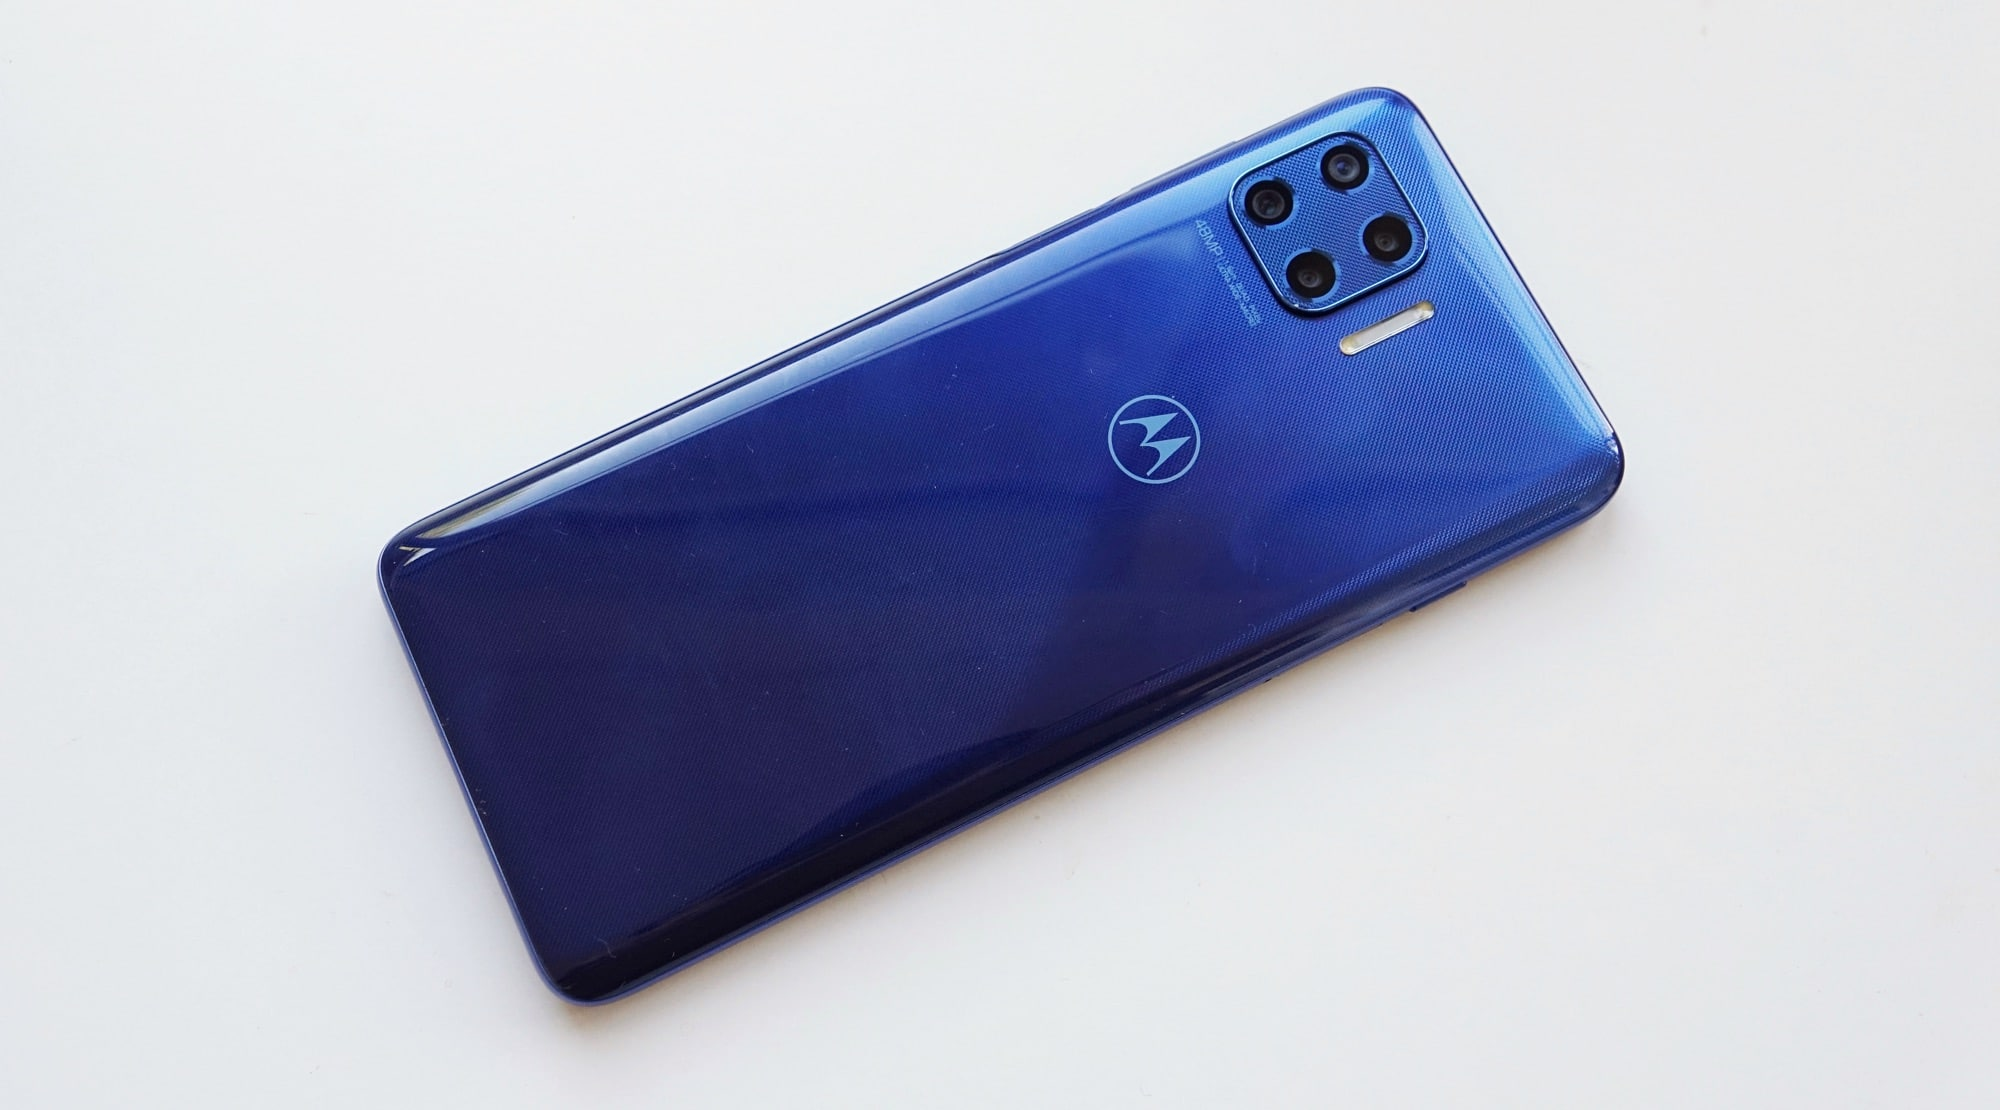 Moto G 5G Plus reviewed